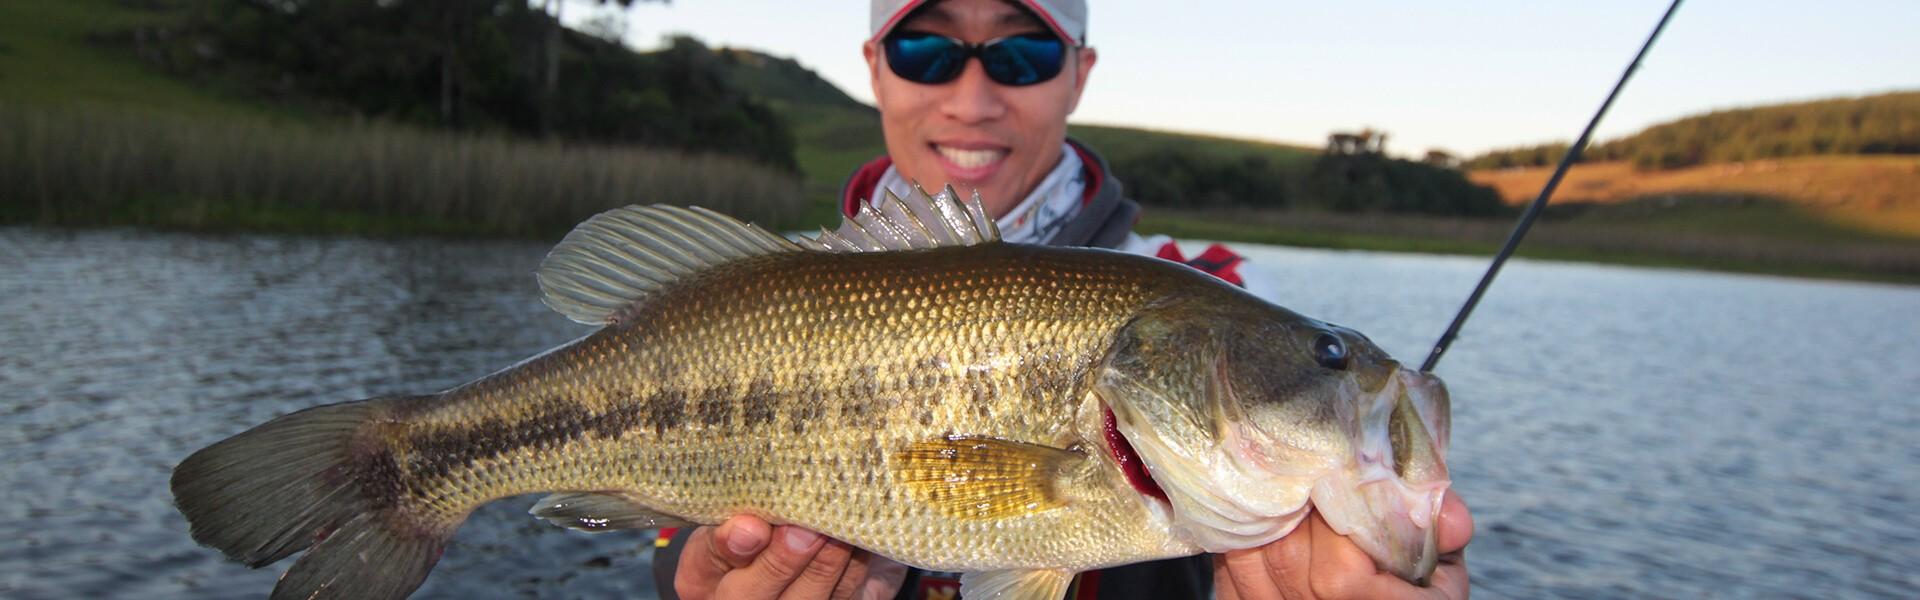 RBT Fishing